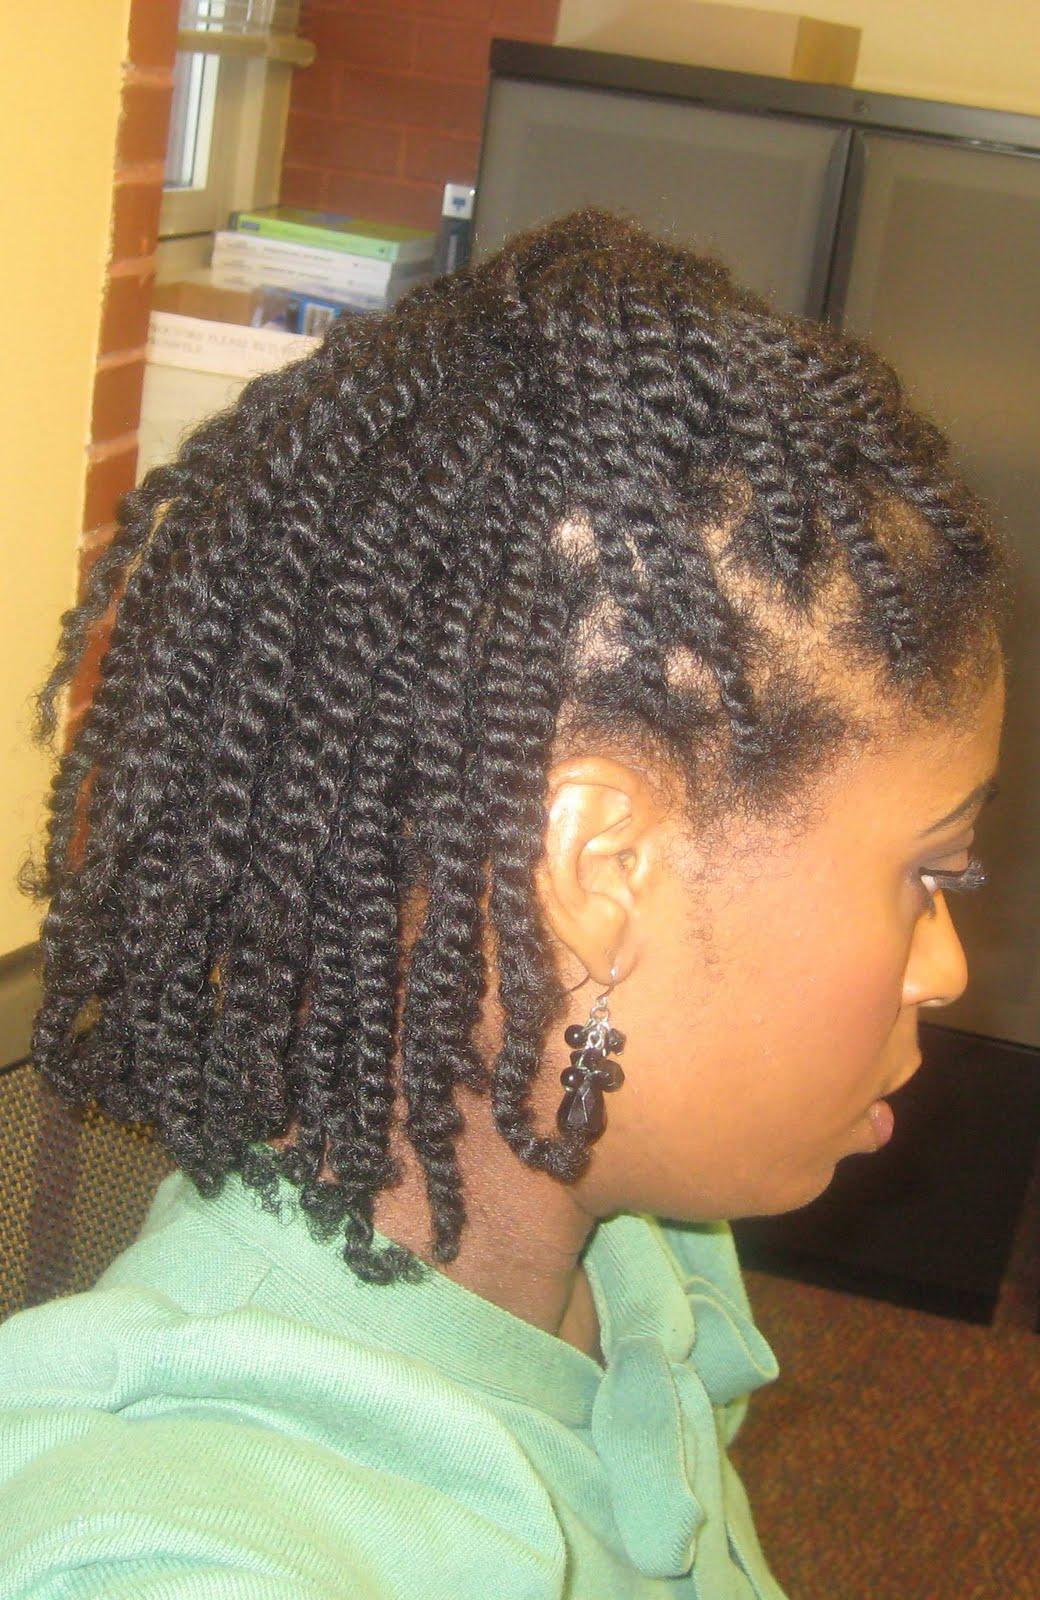 Surprising Naturally Elegant Hair Today Two Strand Twists Short Hairstyles Gunalazisus